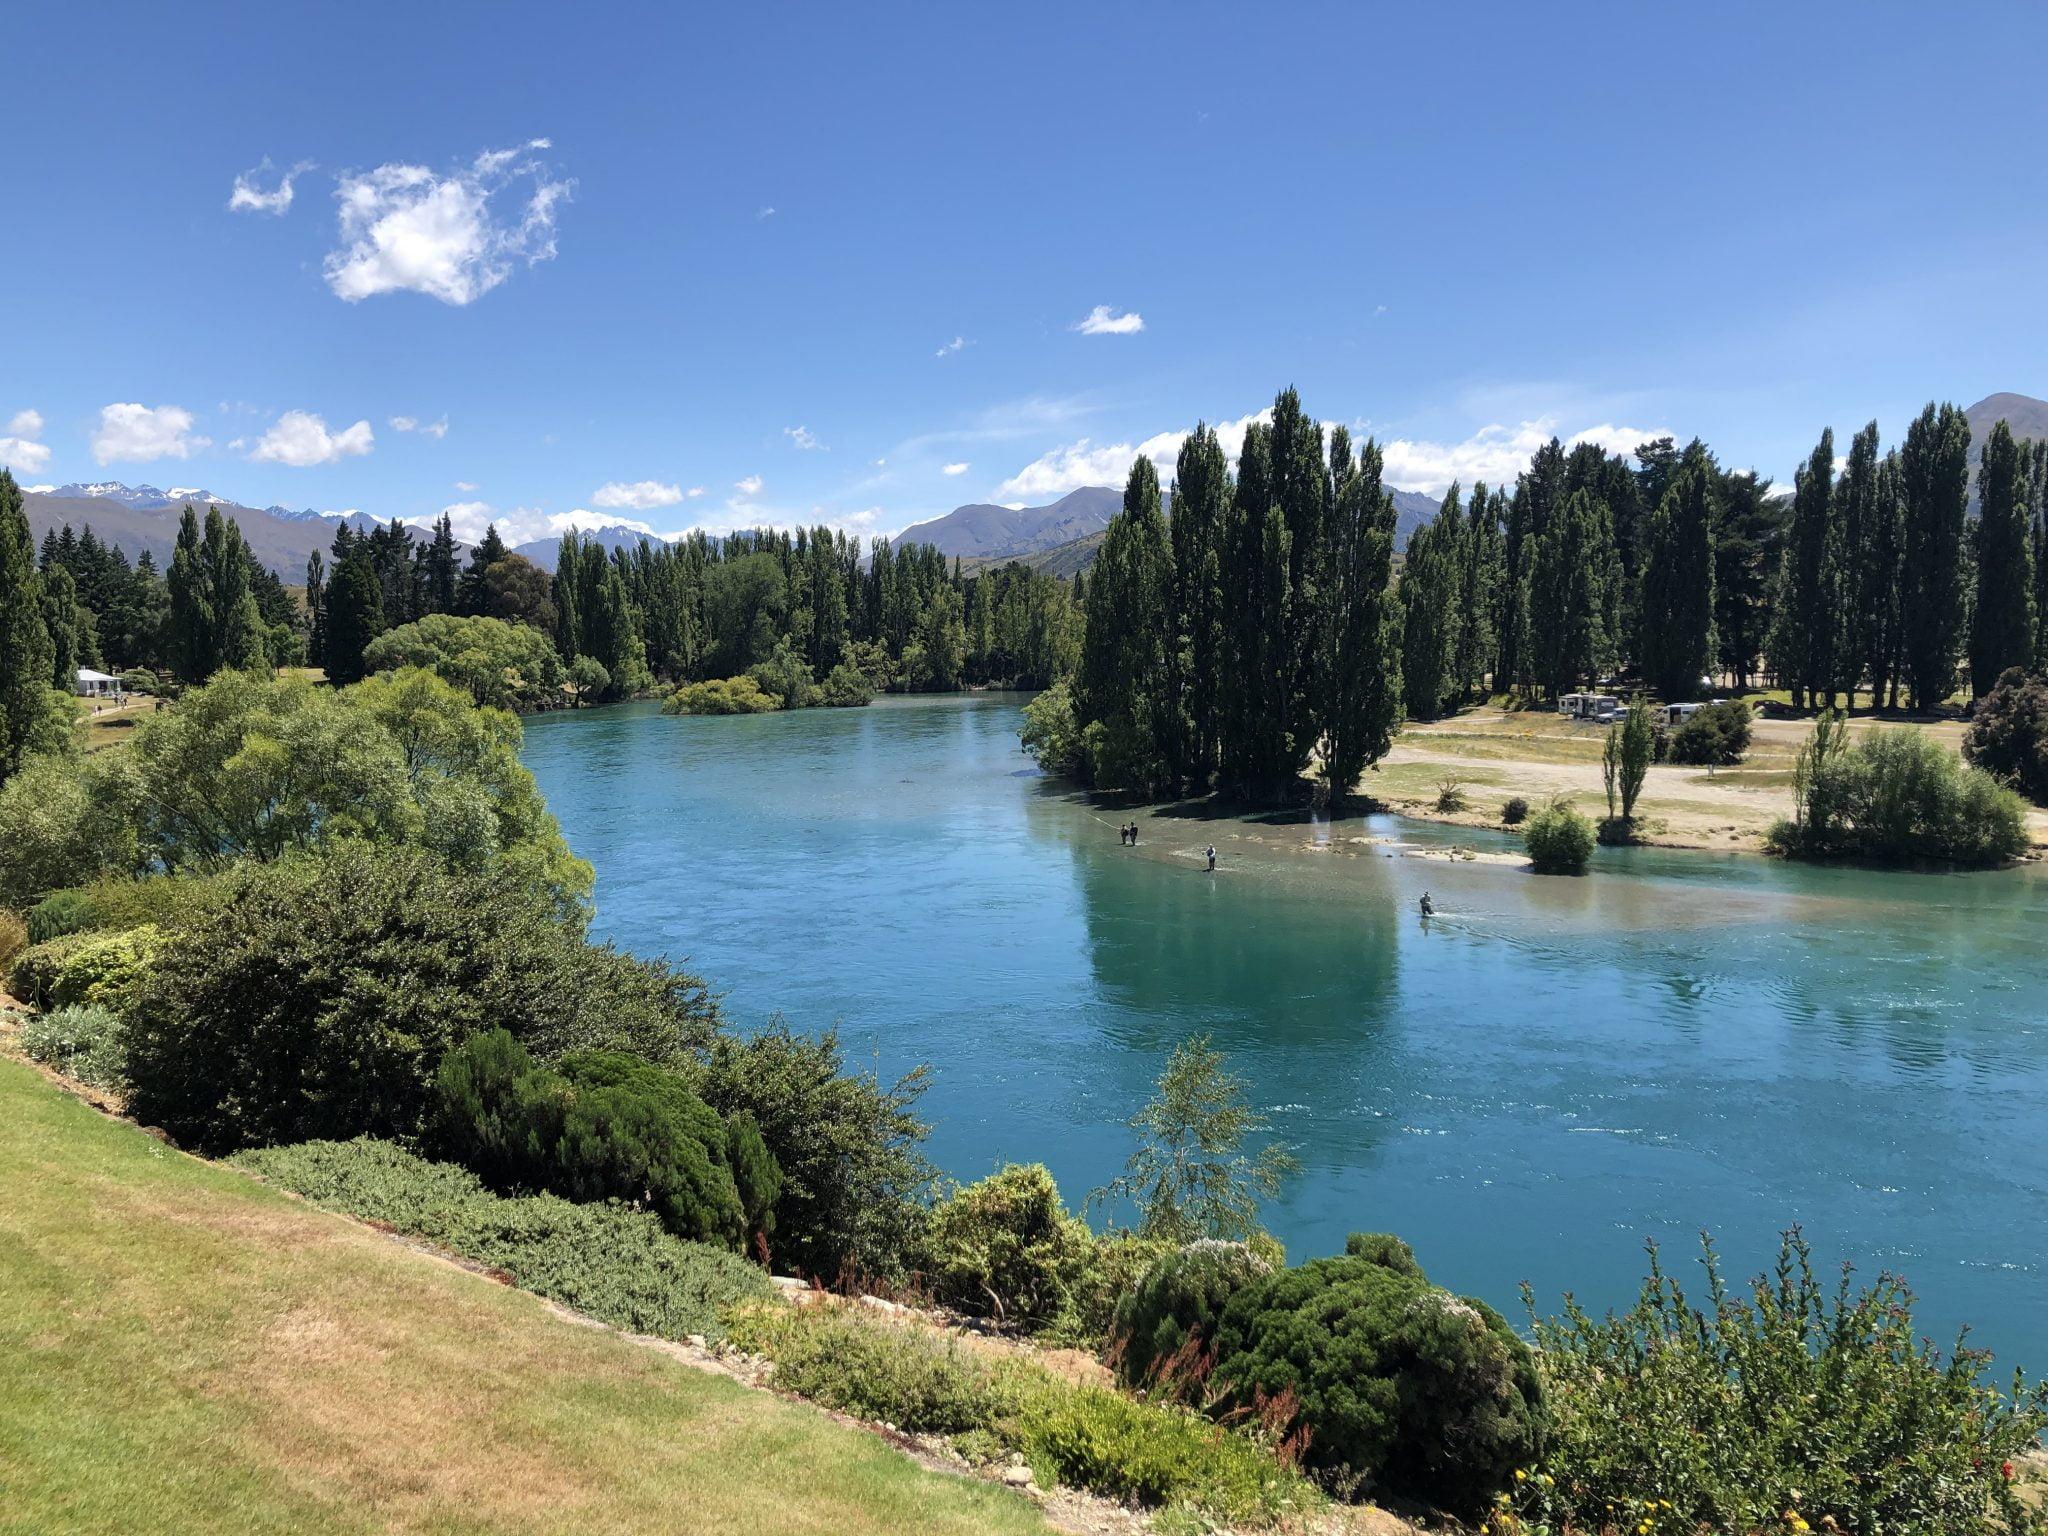 Albert Town, Wanaka, New Zealand